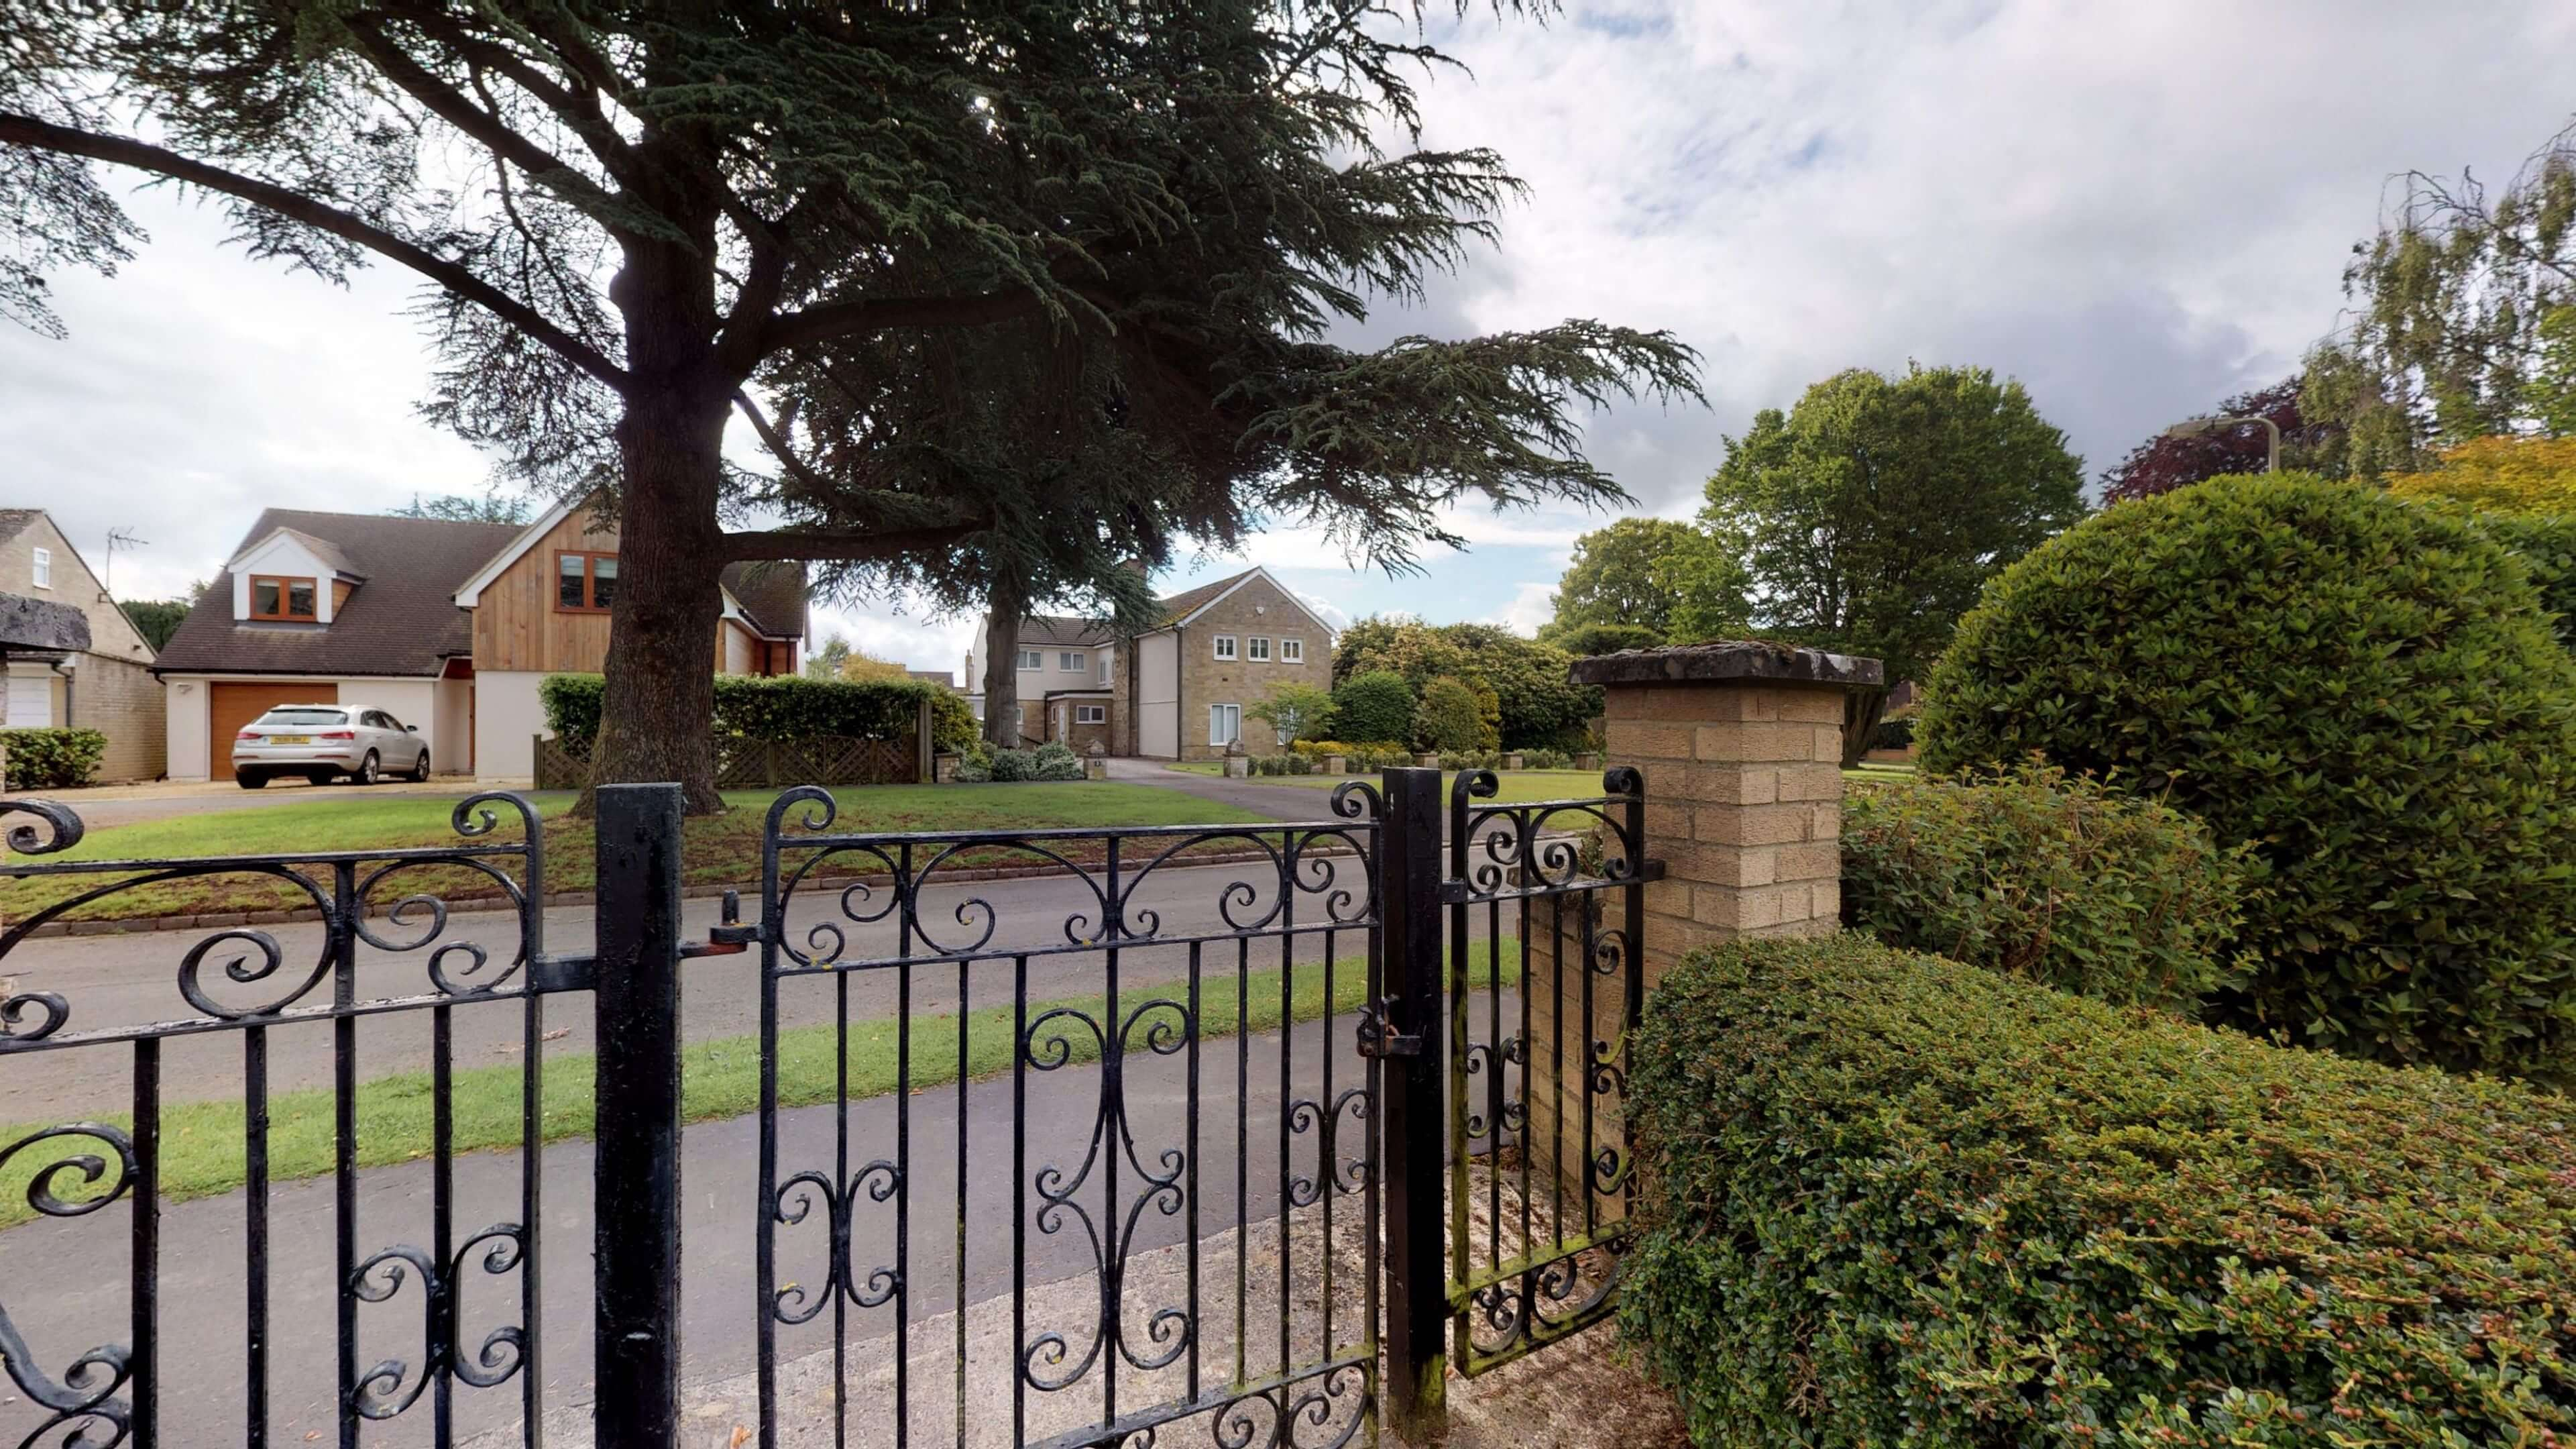 Blenheim Gate View From Gate